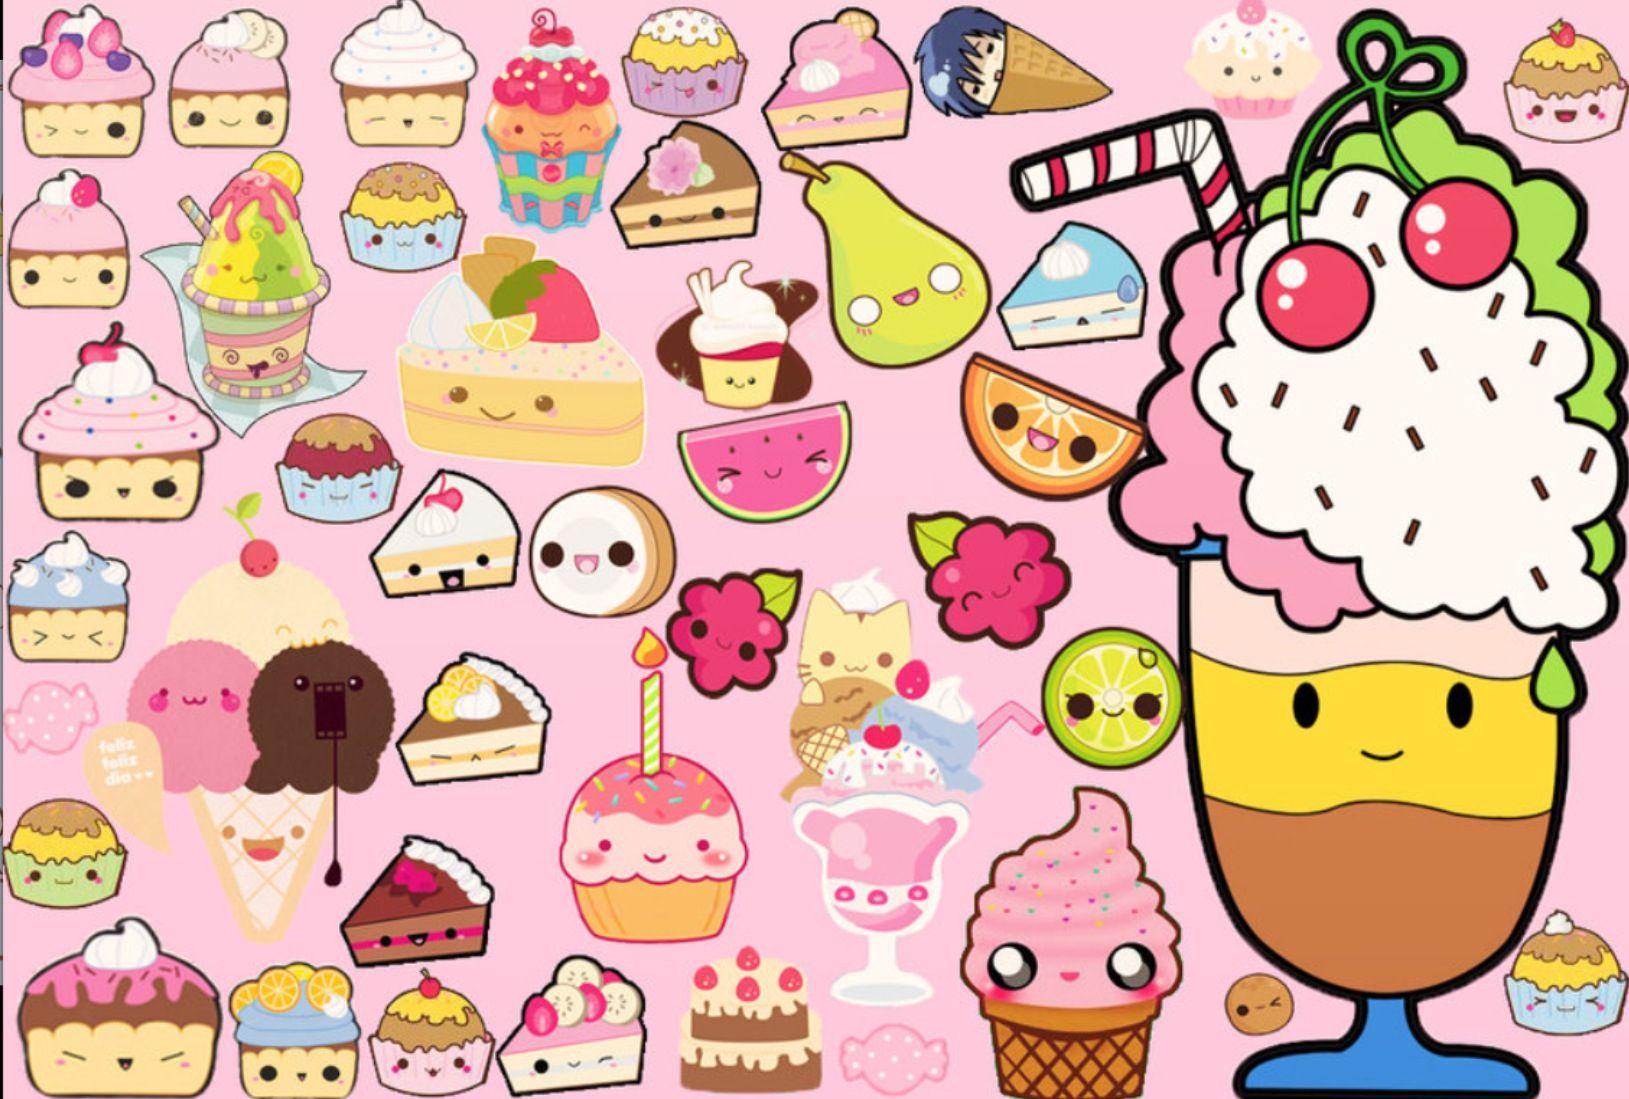 cute kawii wallpaper - photo #29